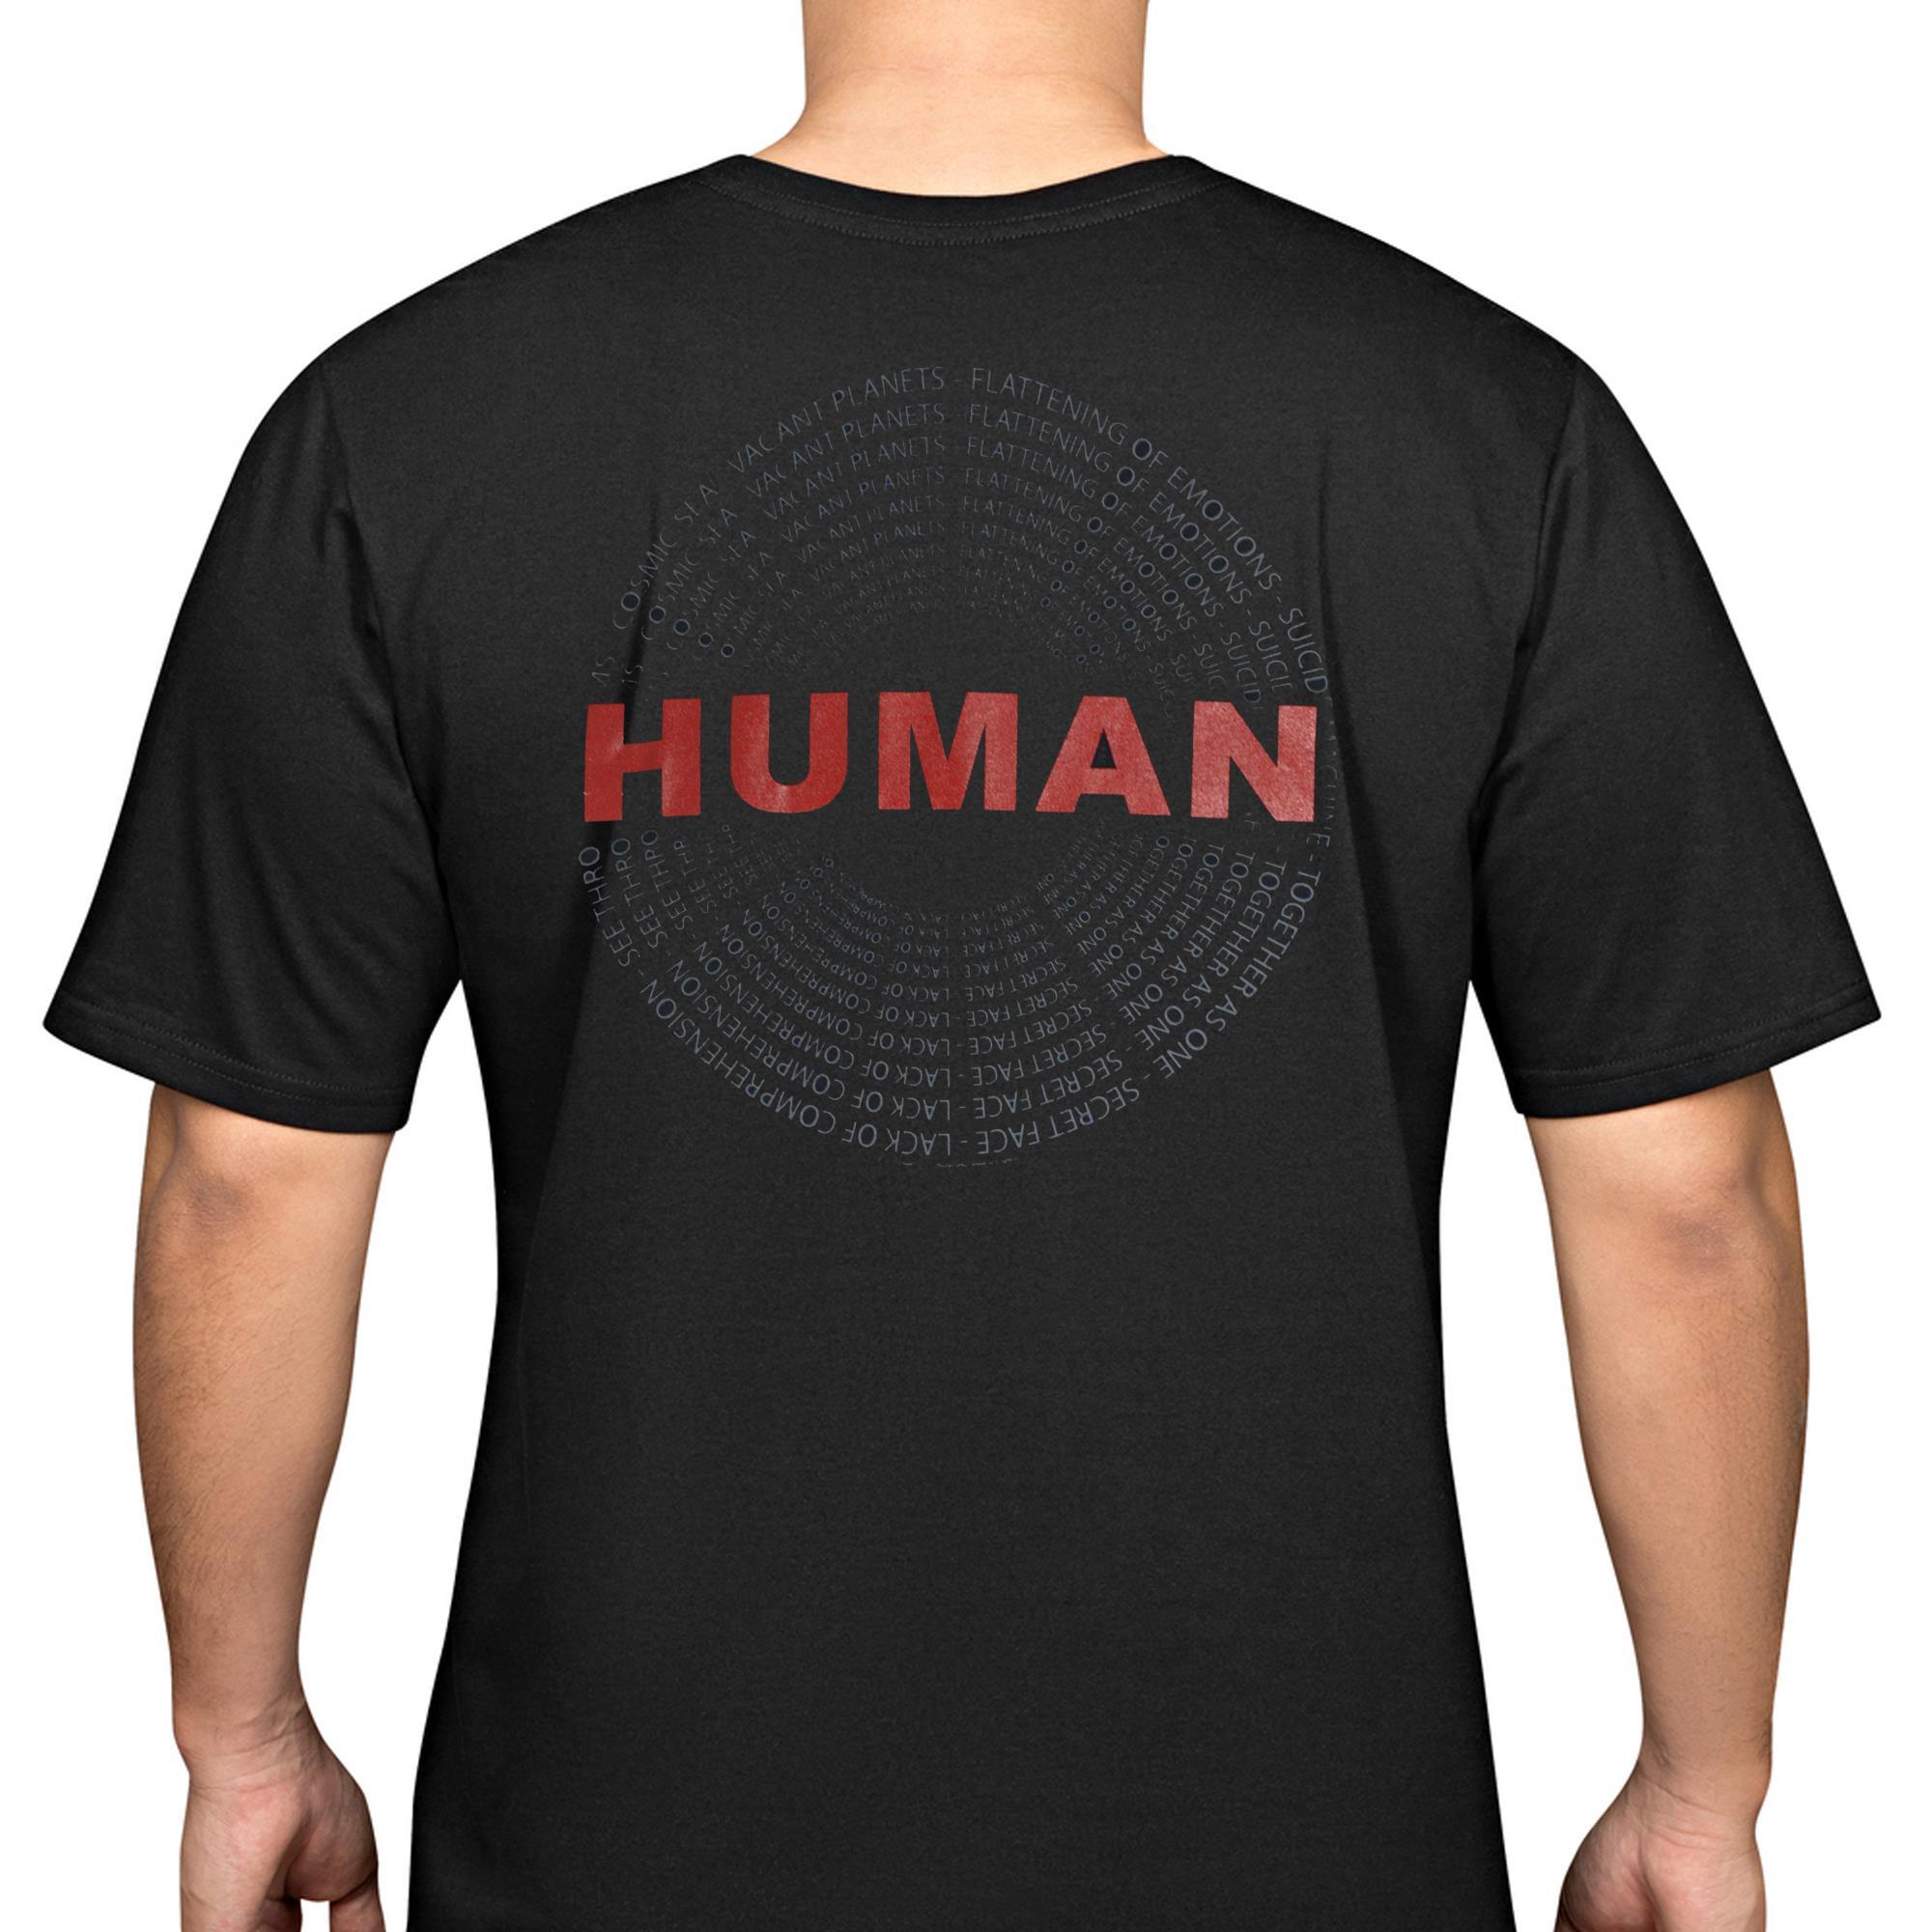 Human (Euro Variant, Import)